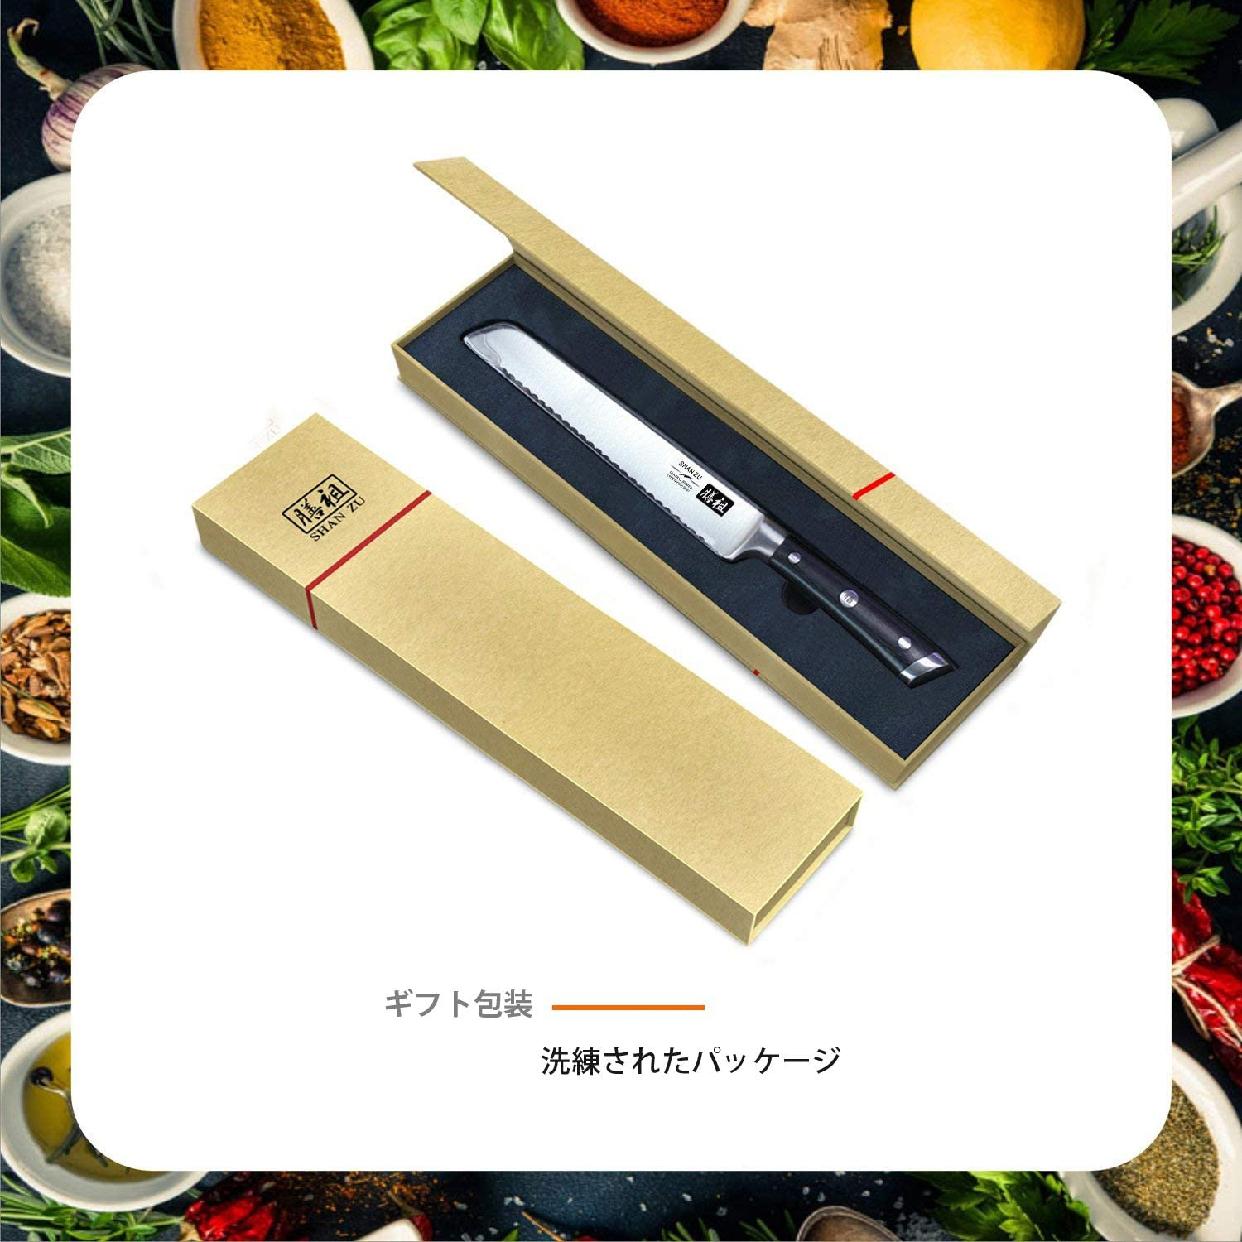 SHANZU 家庭用パンきり包丁 シルバーの商品画像7